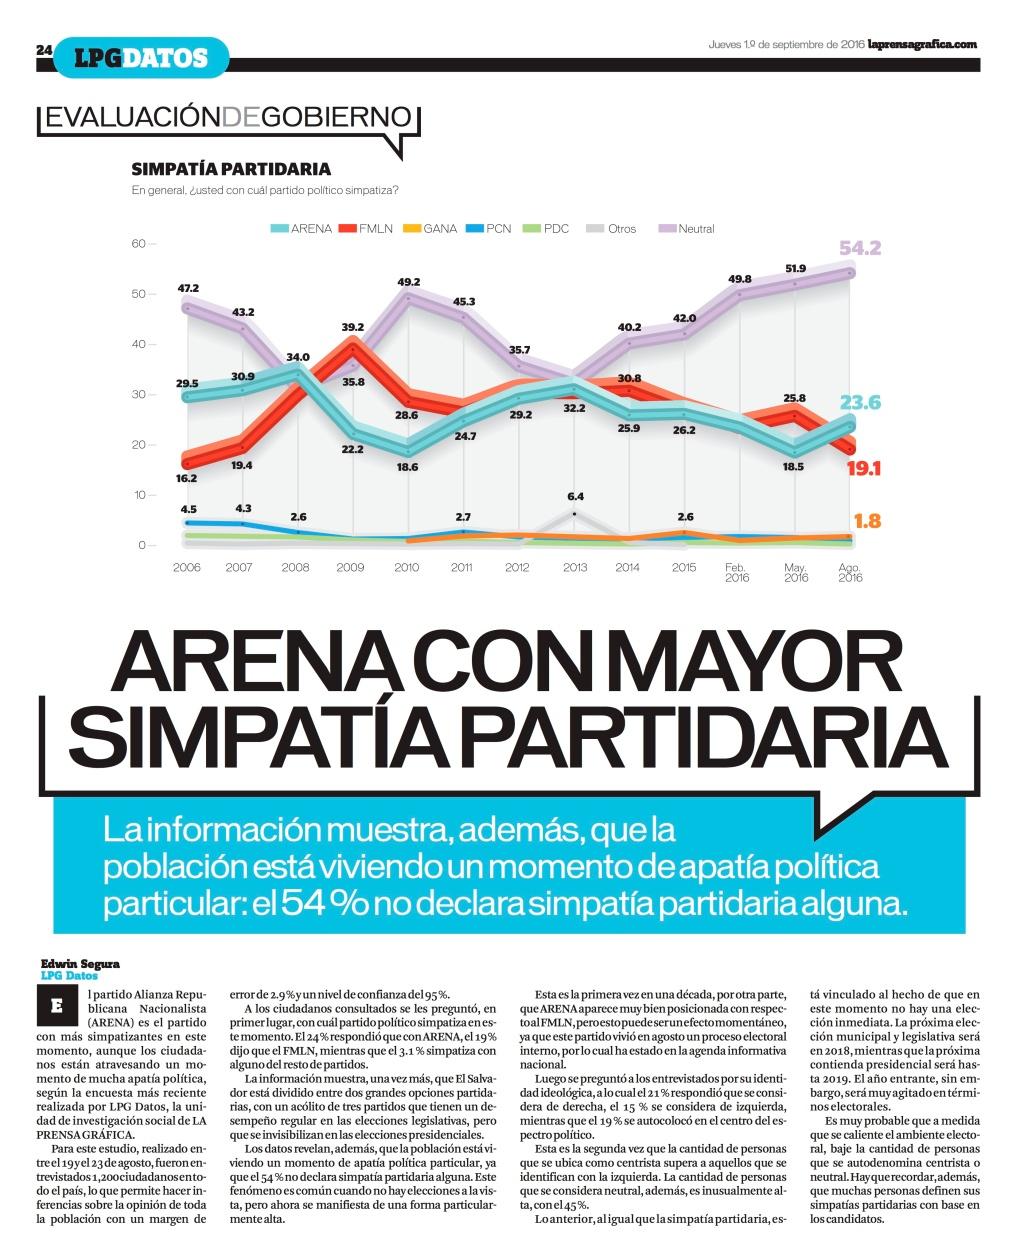 LPG20160901 - La Prensa Gráfica - PORTADA - pag 24